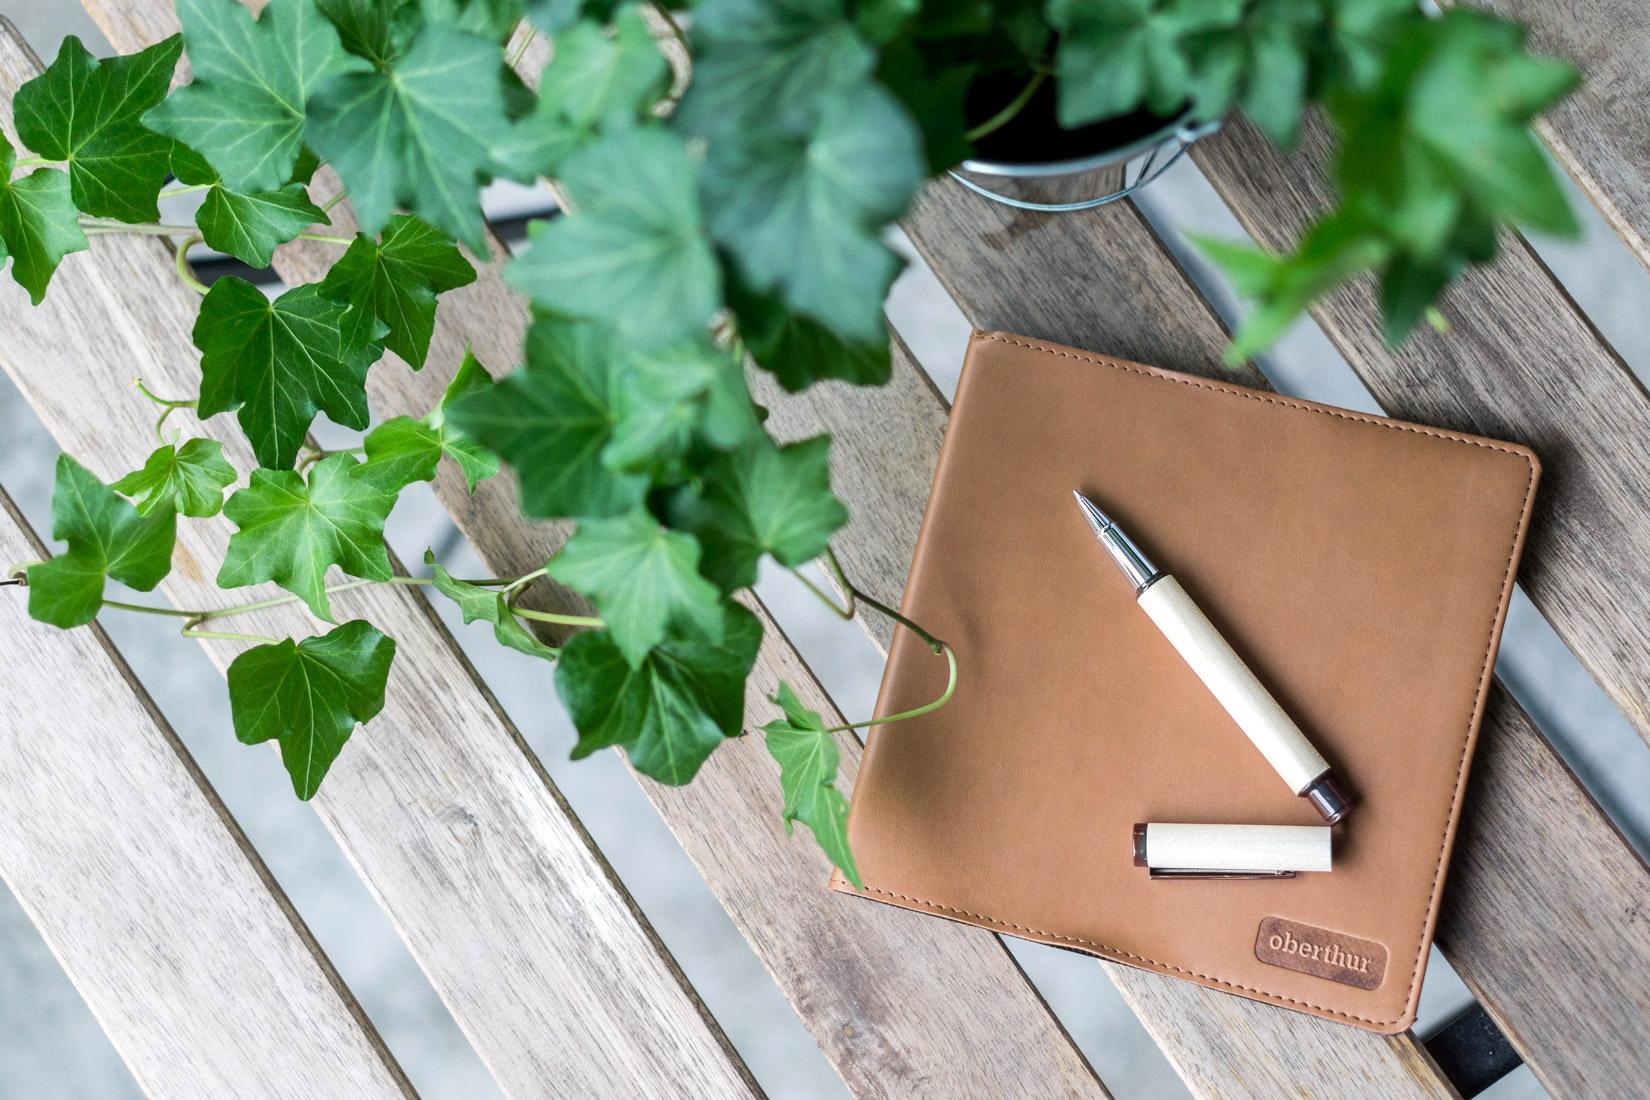 stylo-roller-avantages-article-blog-oberthur-lifestyle-papeterie-ecriture